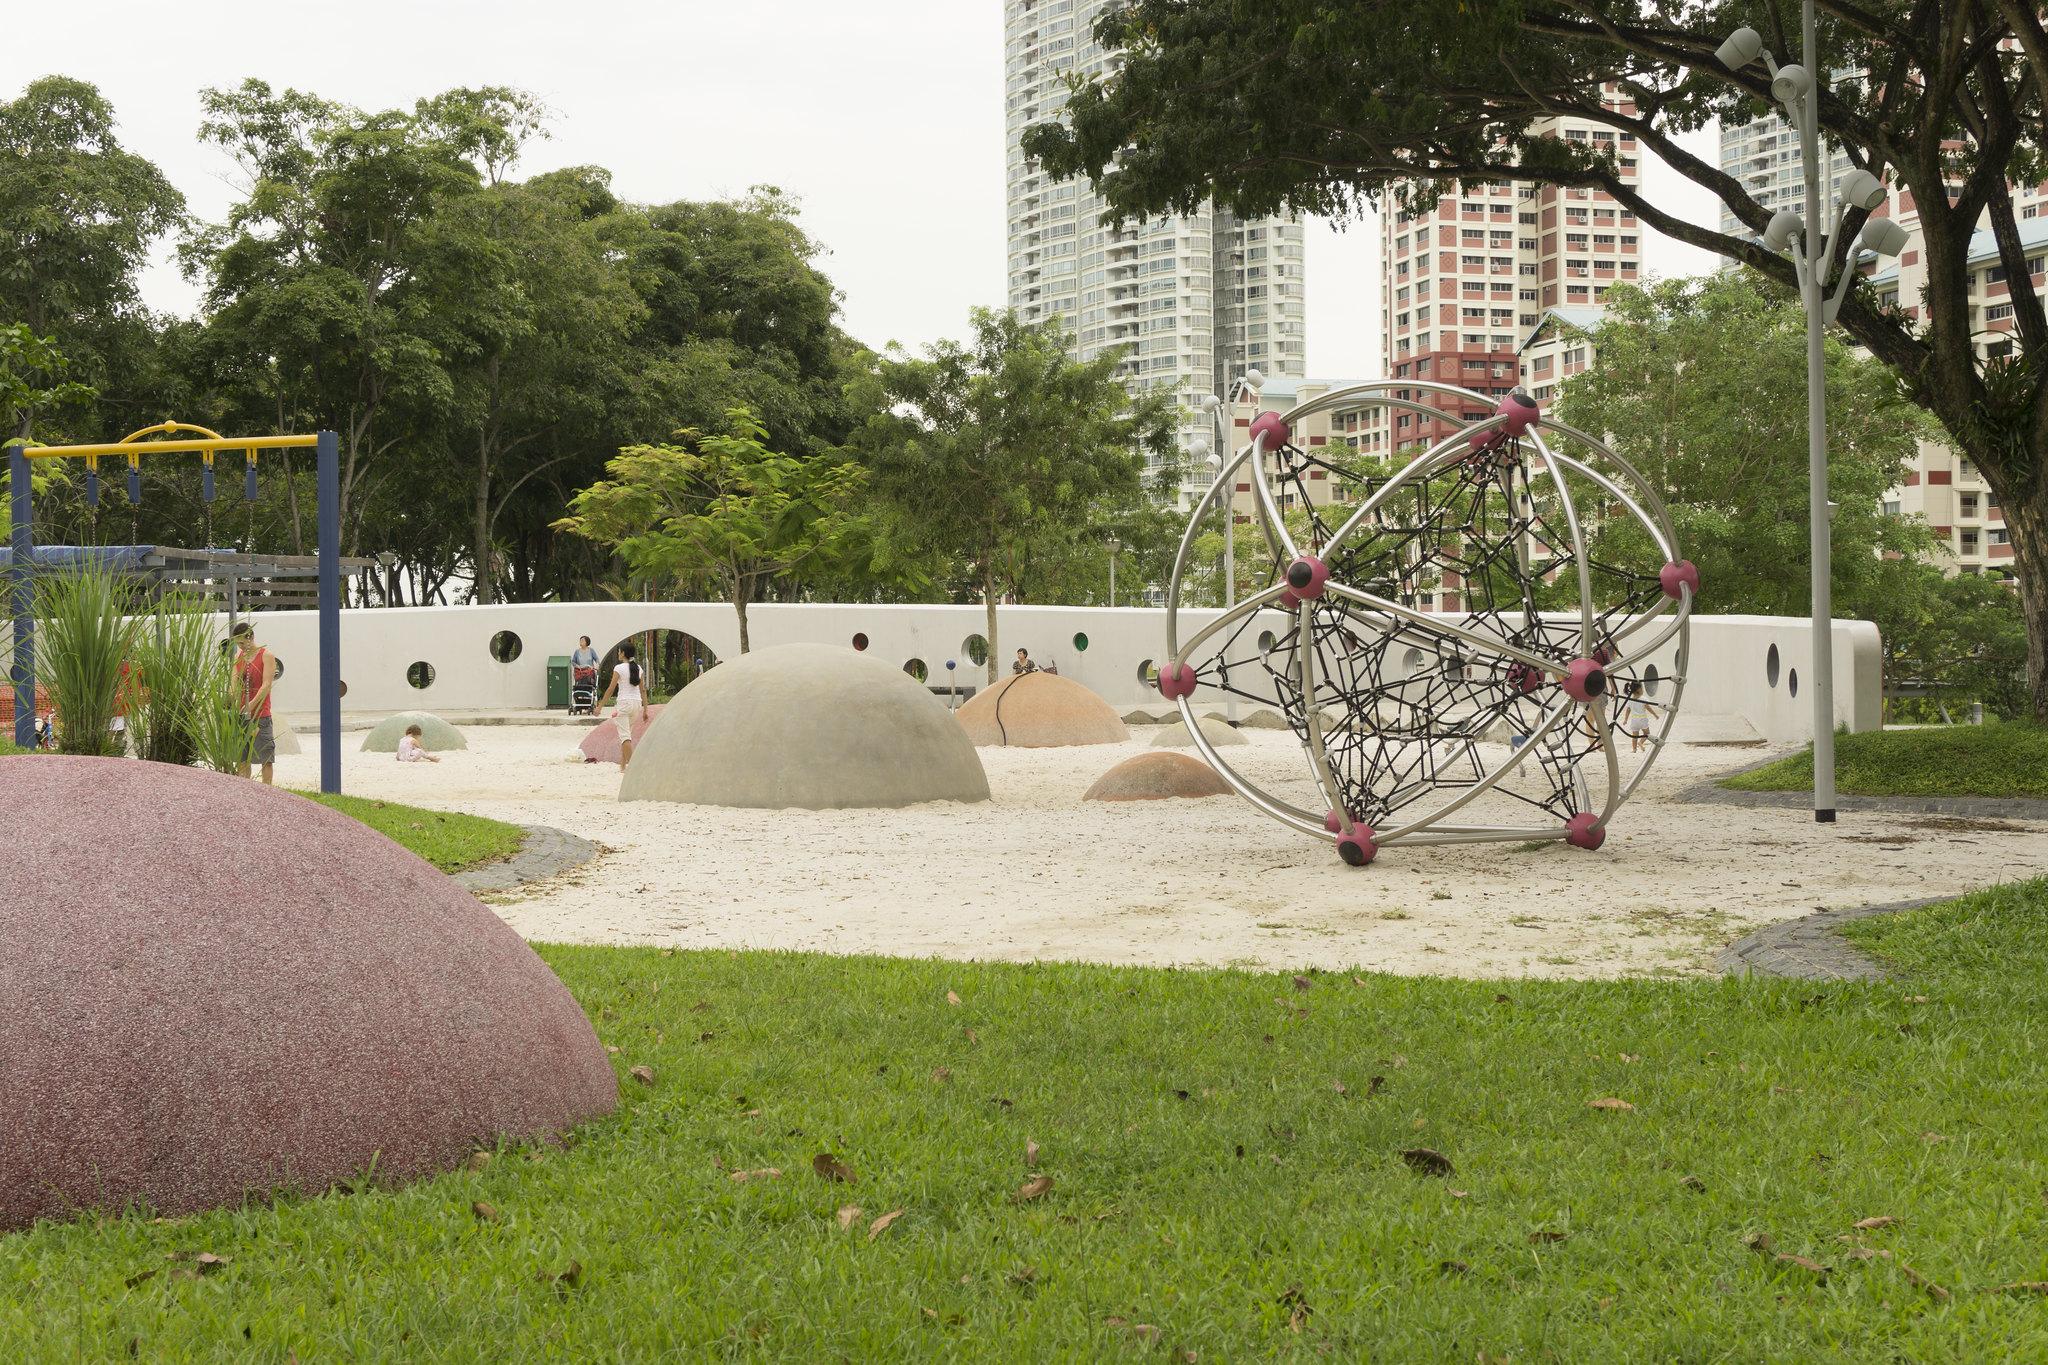 bishan ang mo kio park outdoor playground singapore